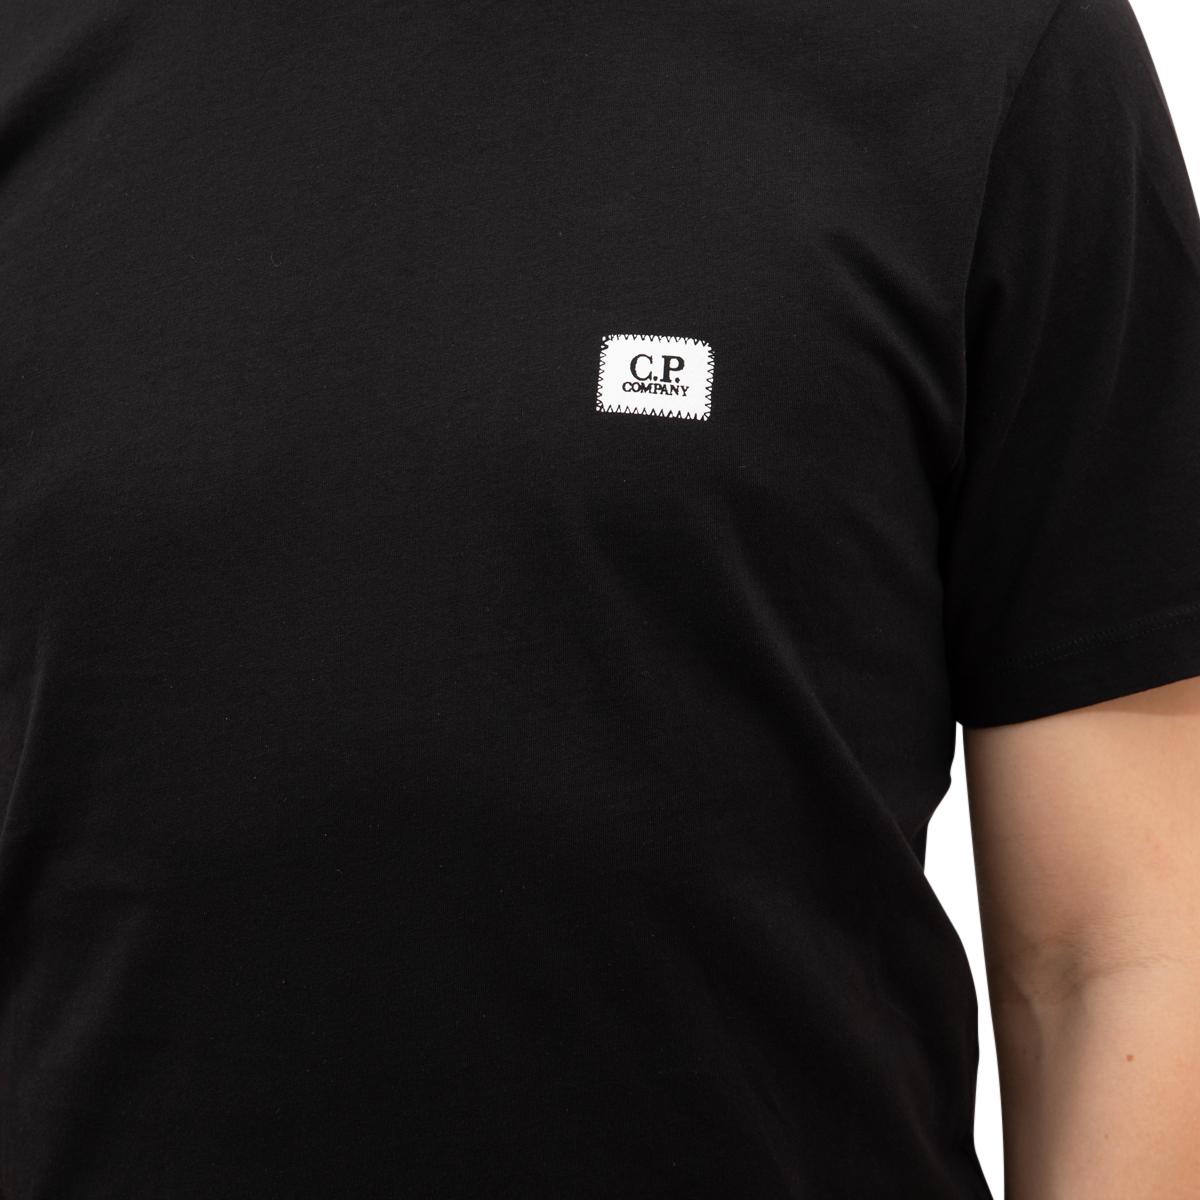 CP Company Jersey 30/1 Logo Badge T-Shirt